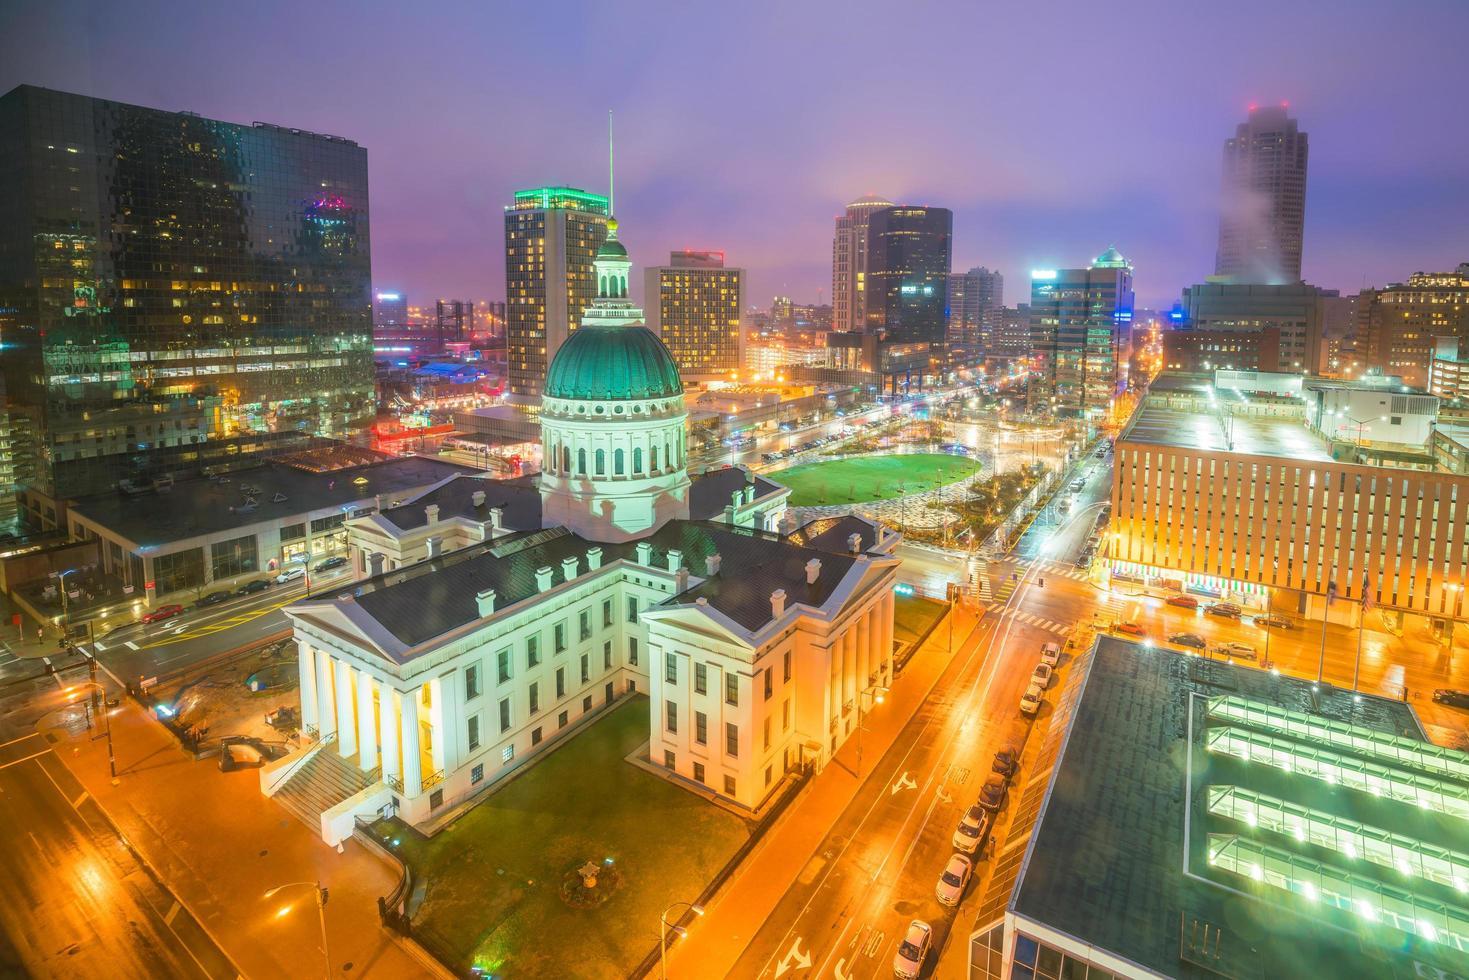 st. Louis downtown skyline bij schemering foto